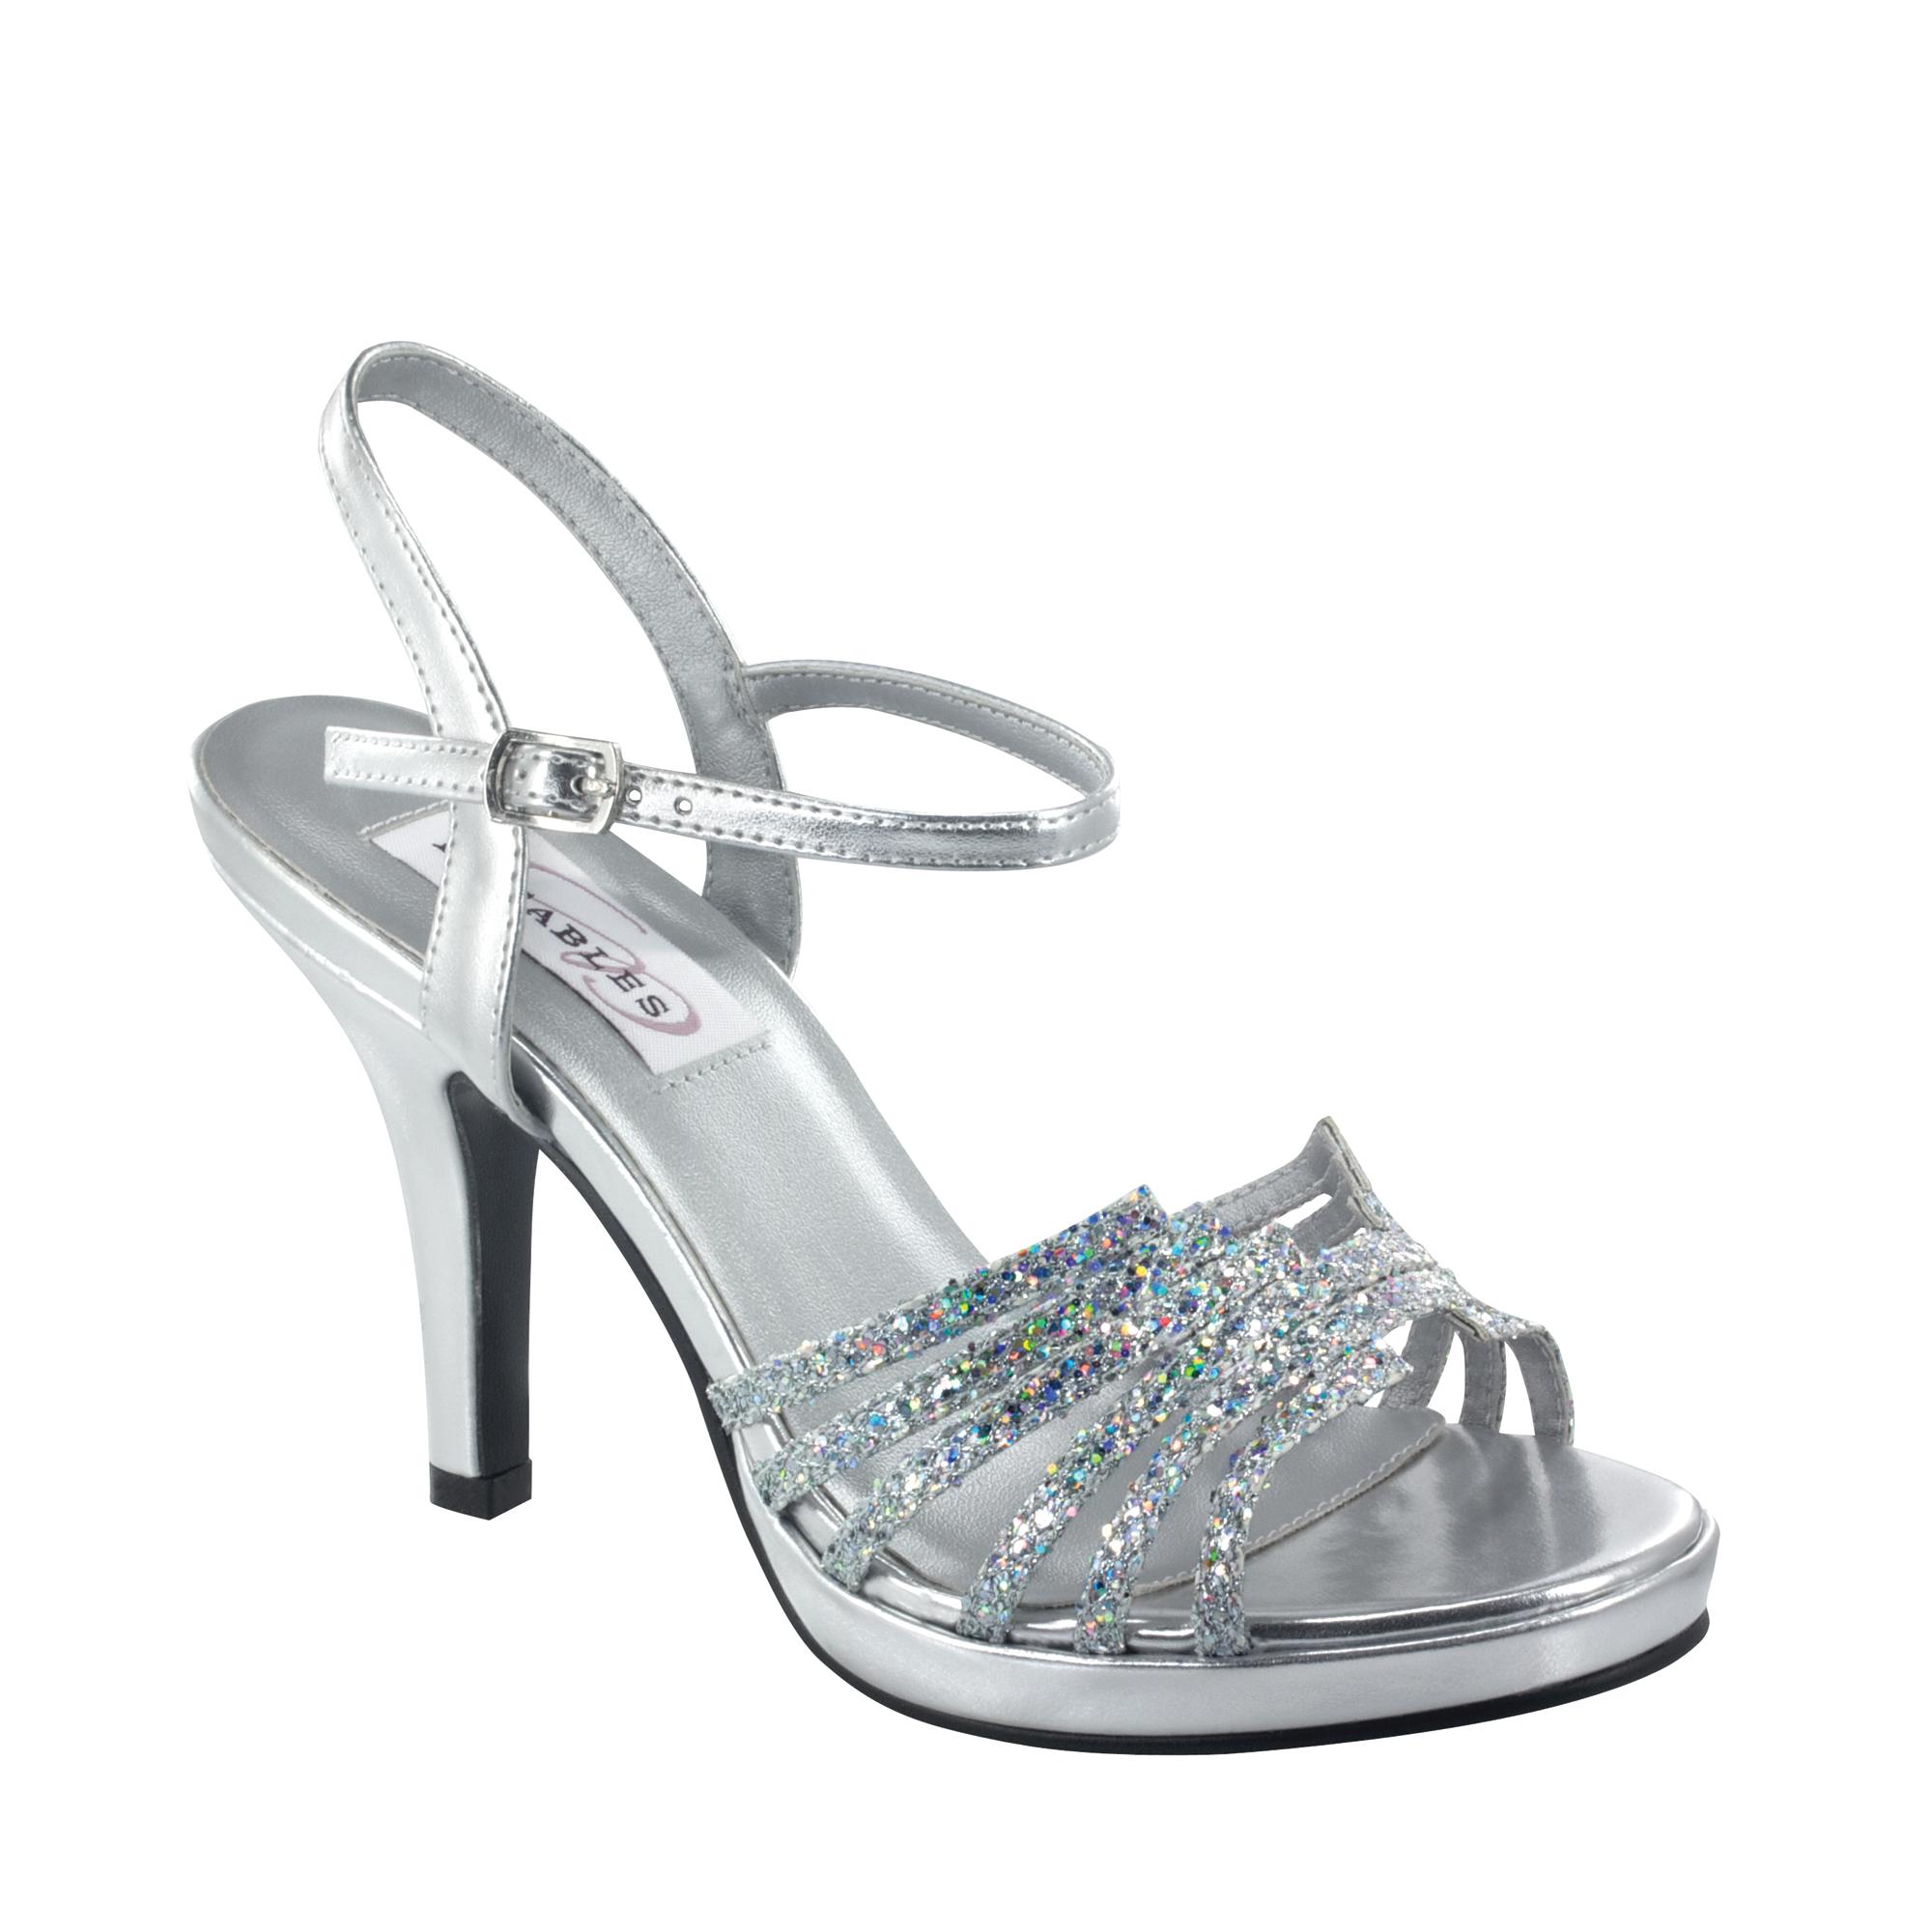 Vegan Shoes Wide Sizes